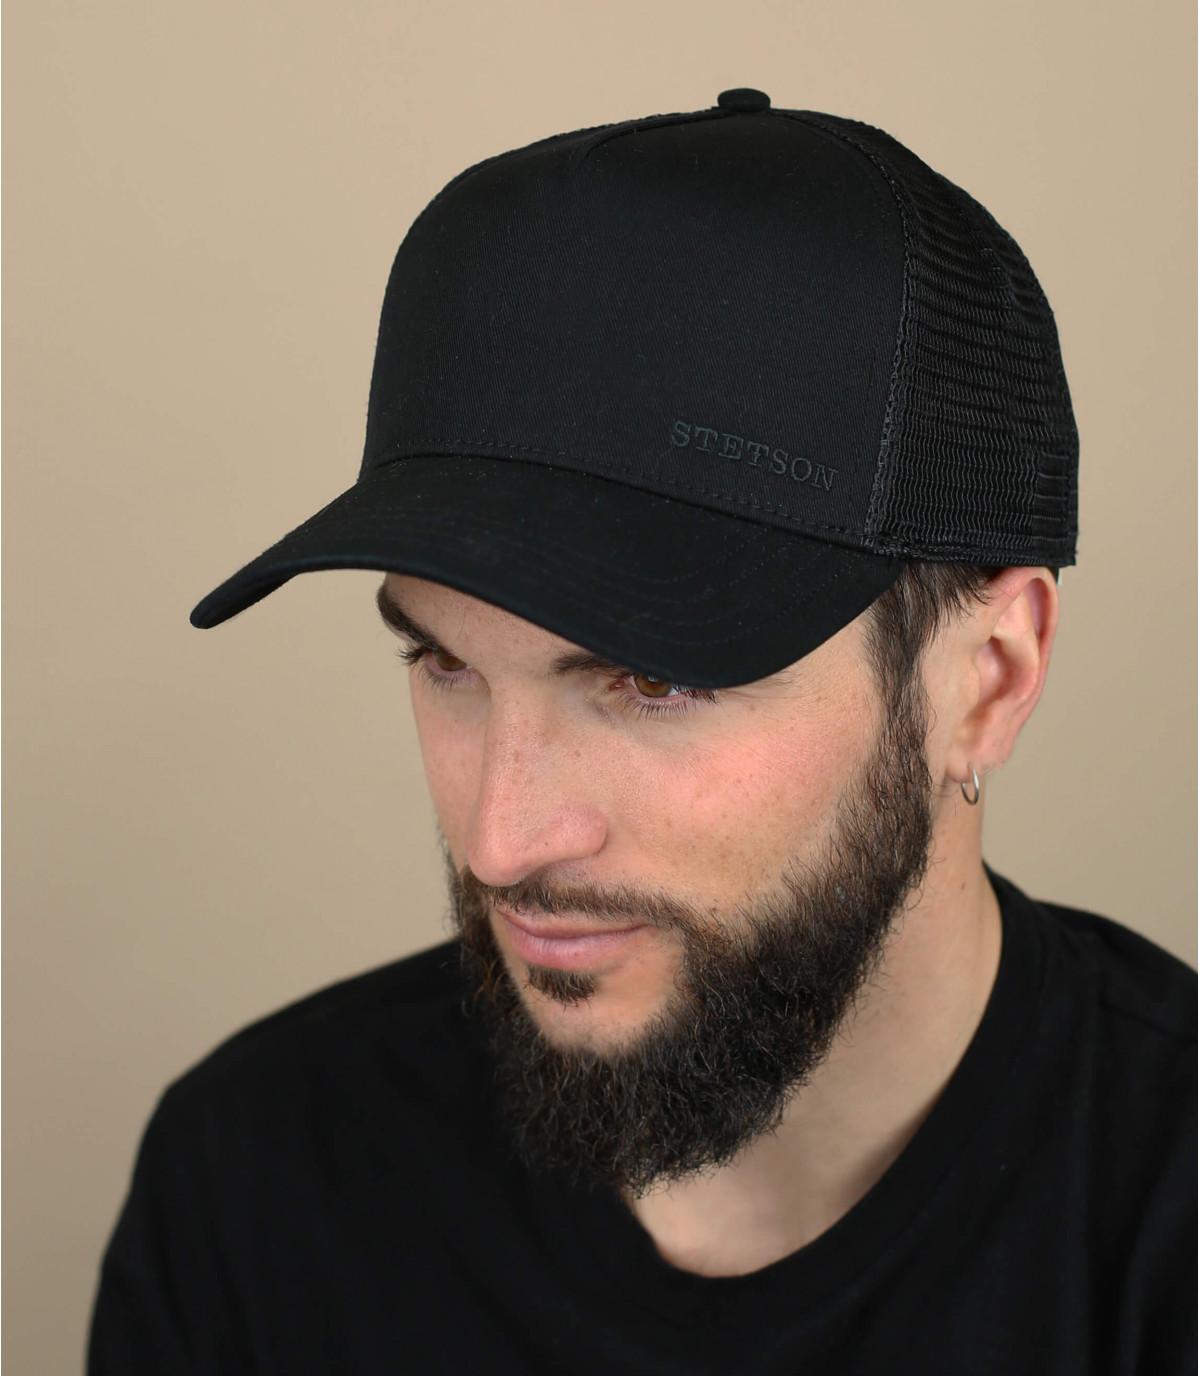 schwarze Trucker Cap